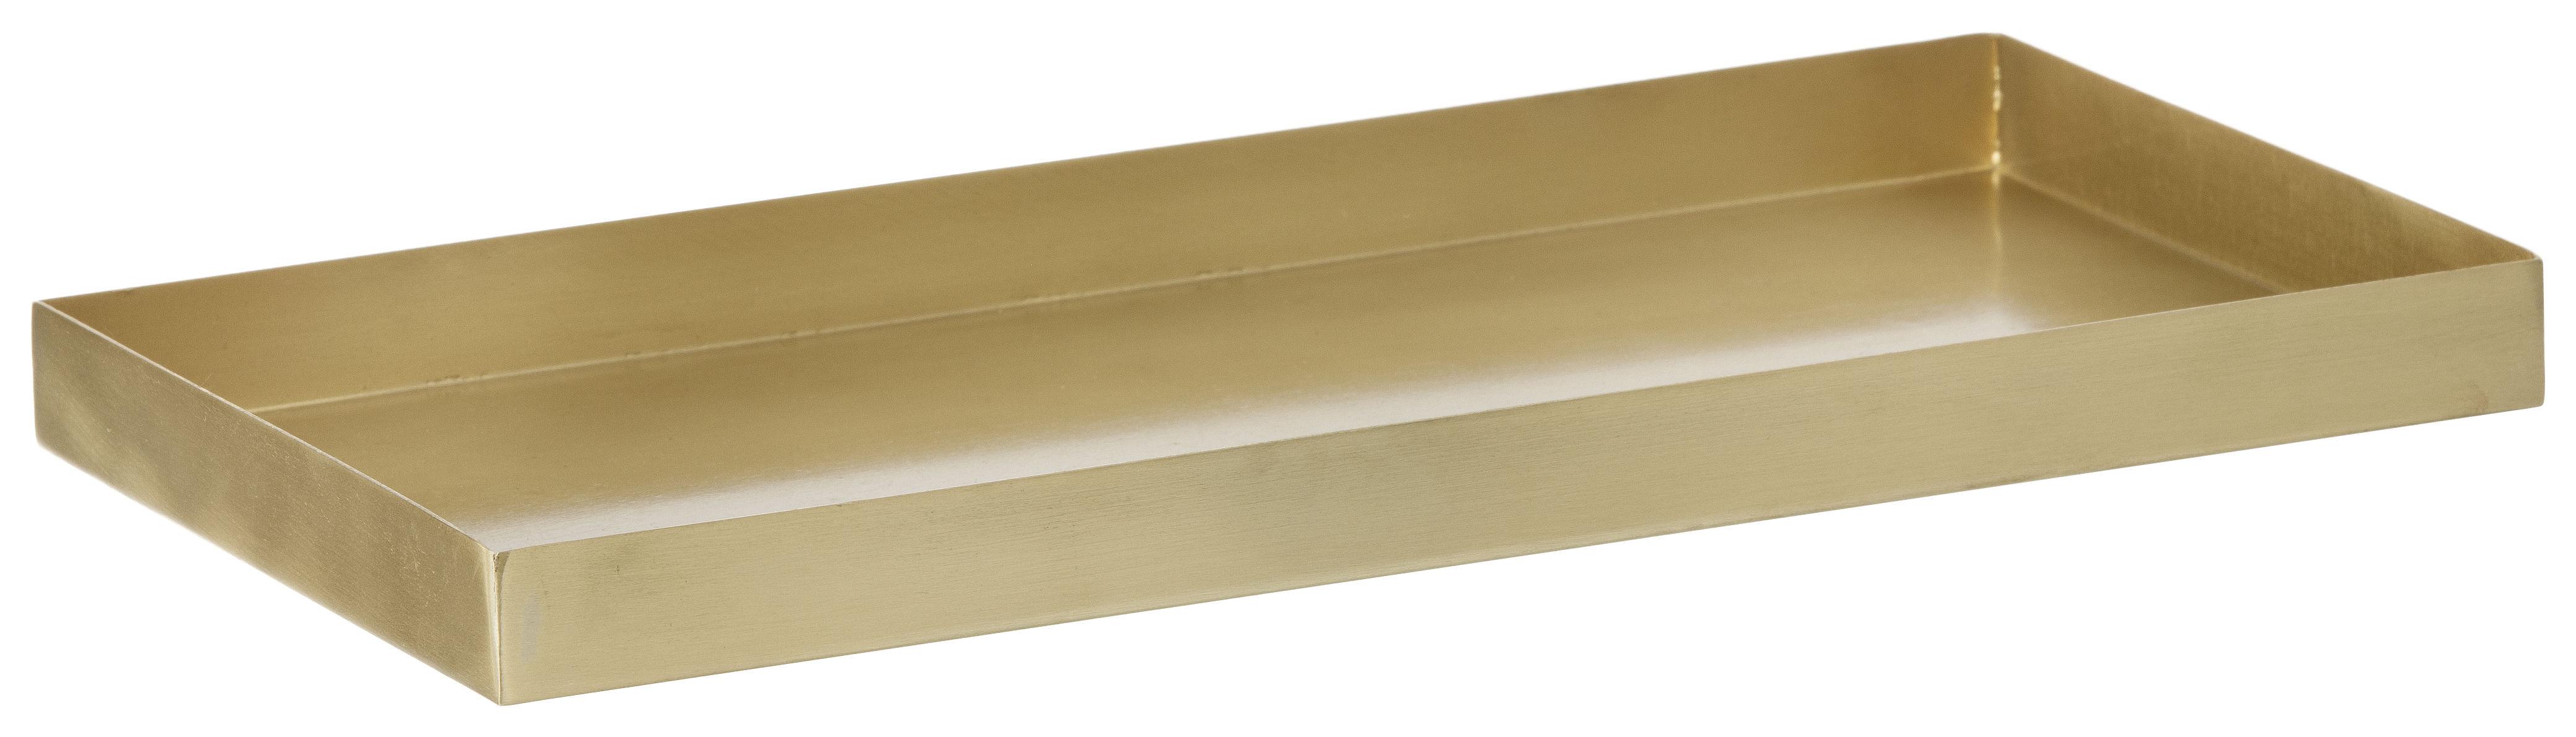 Accessories - Desk & Office Accessories - Brass Tray by Ferm Living - Brass - Brass